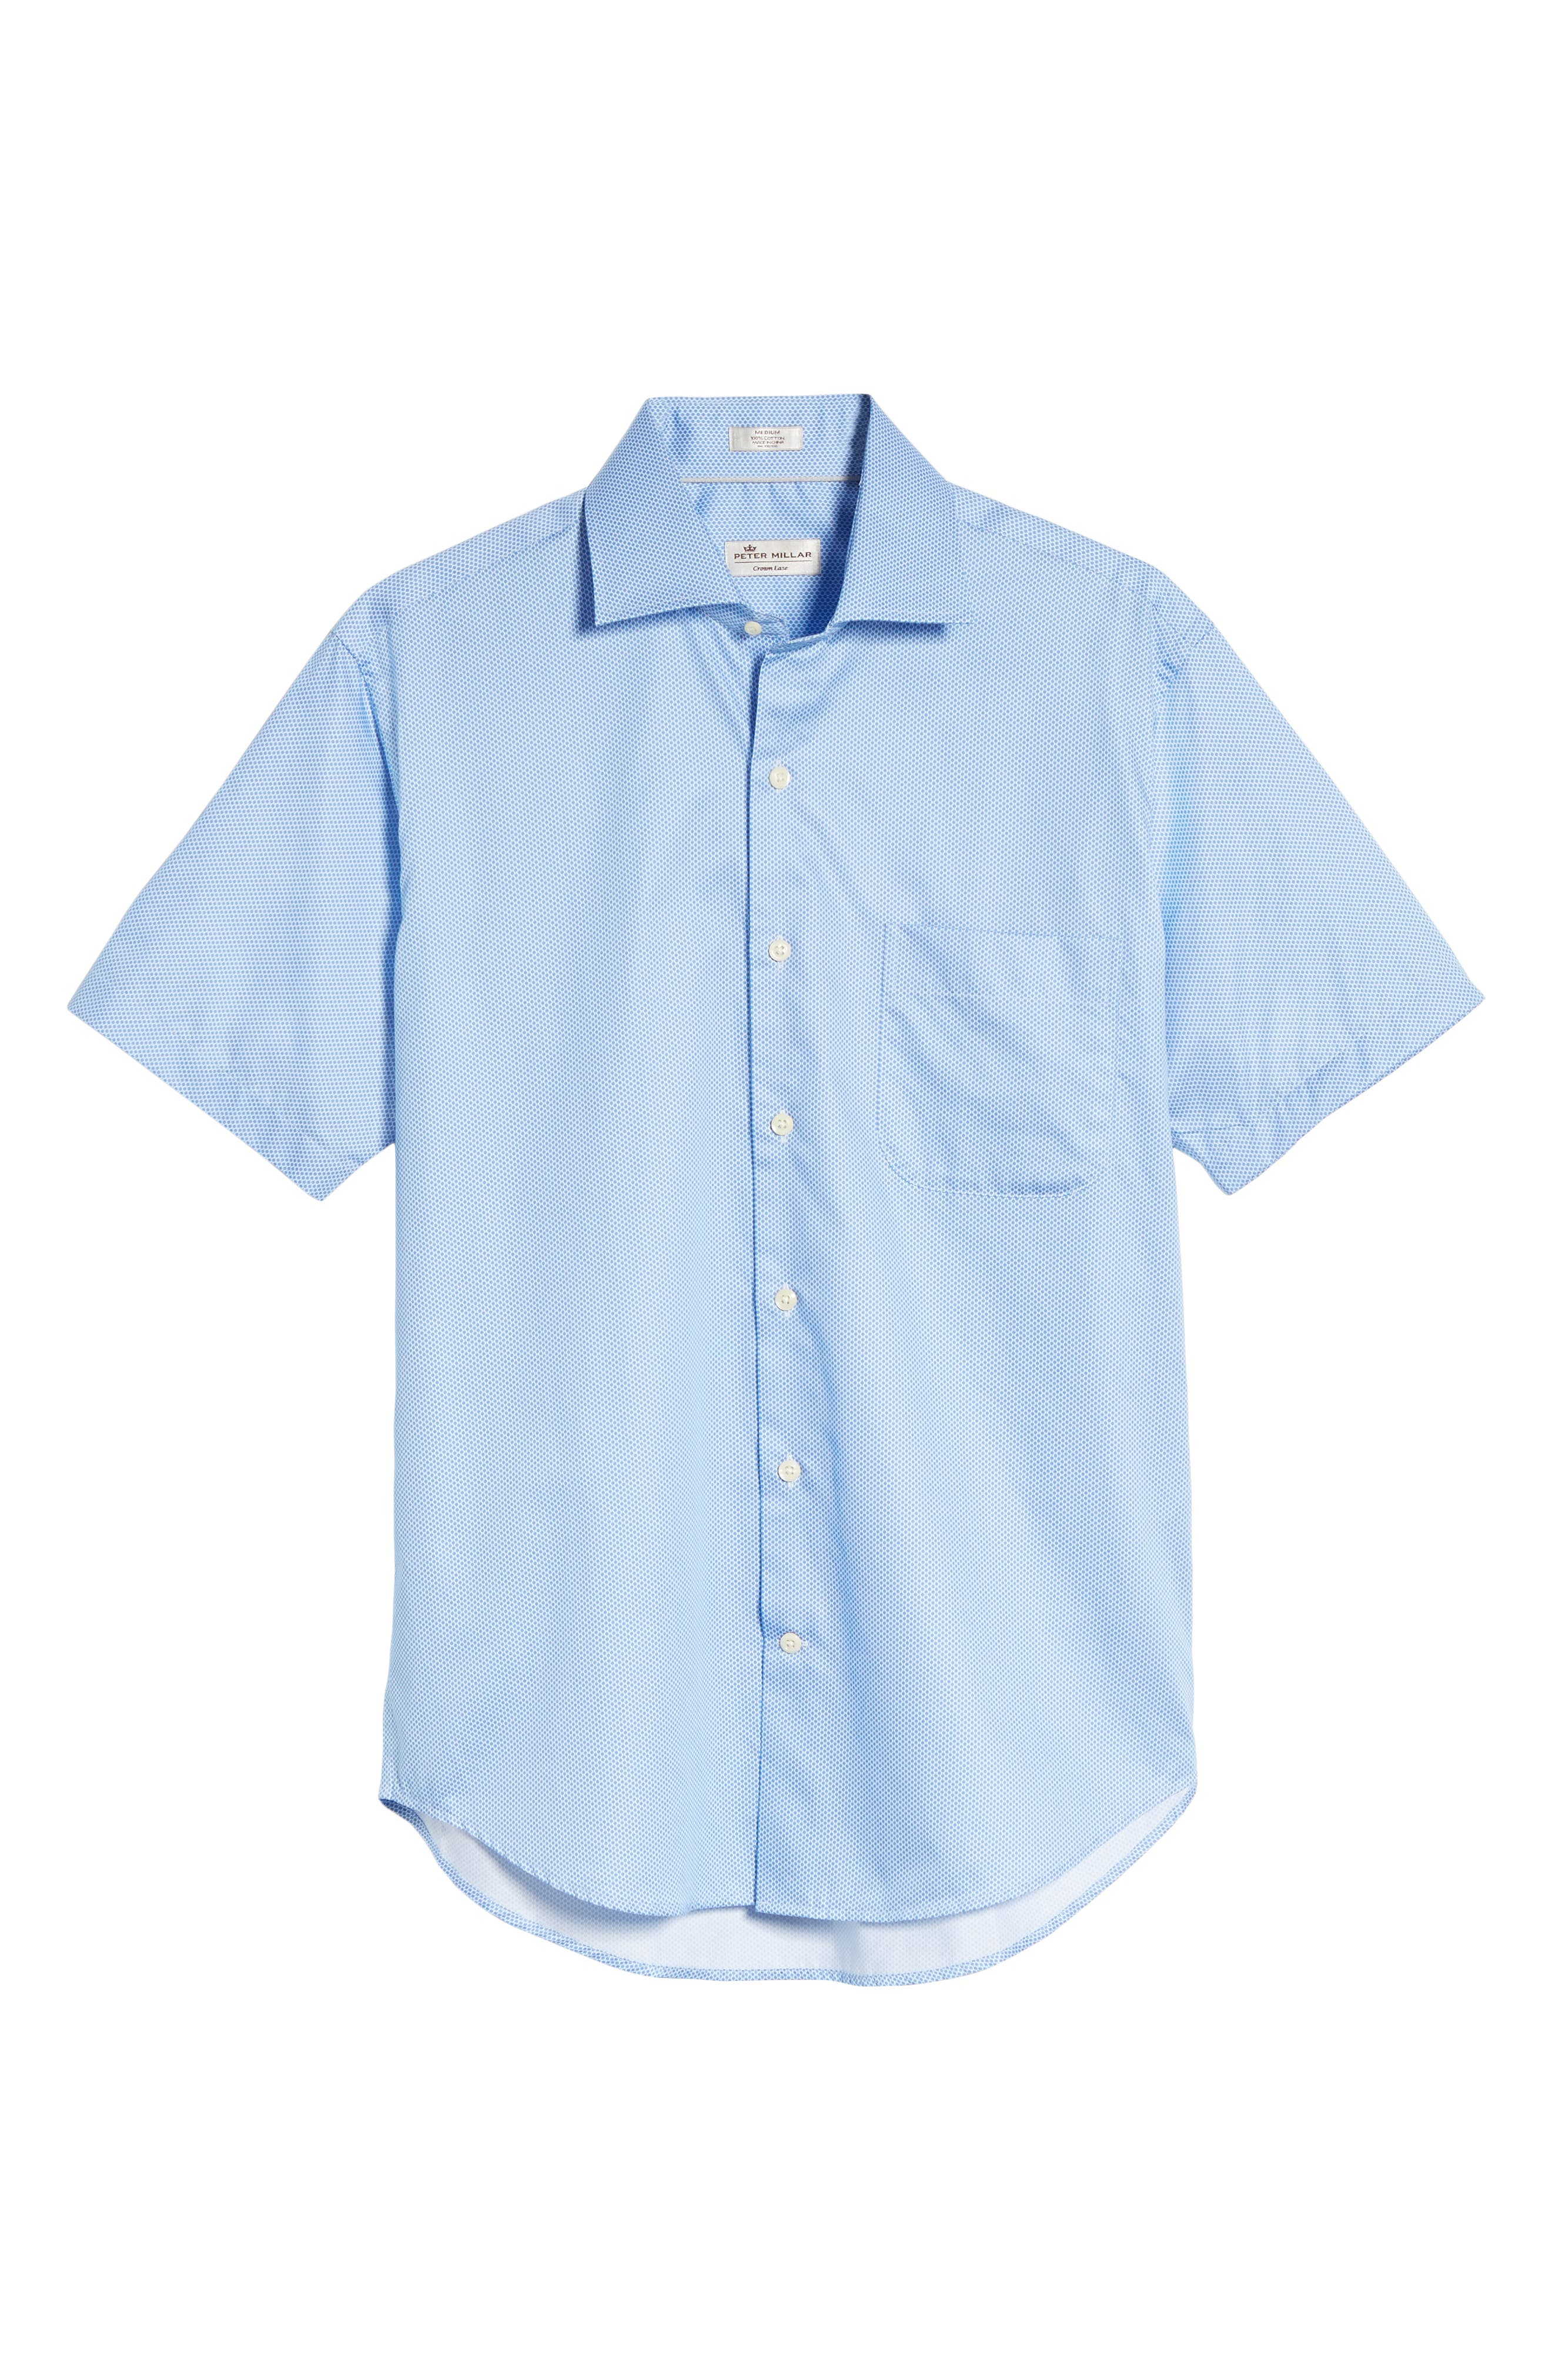 Crown Ease Connecting the Dots Sport Shirt,                             Alternate thumbnail 6, color,                             Atlas Blue